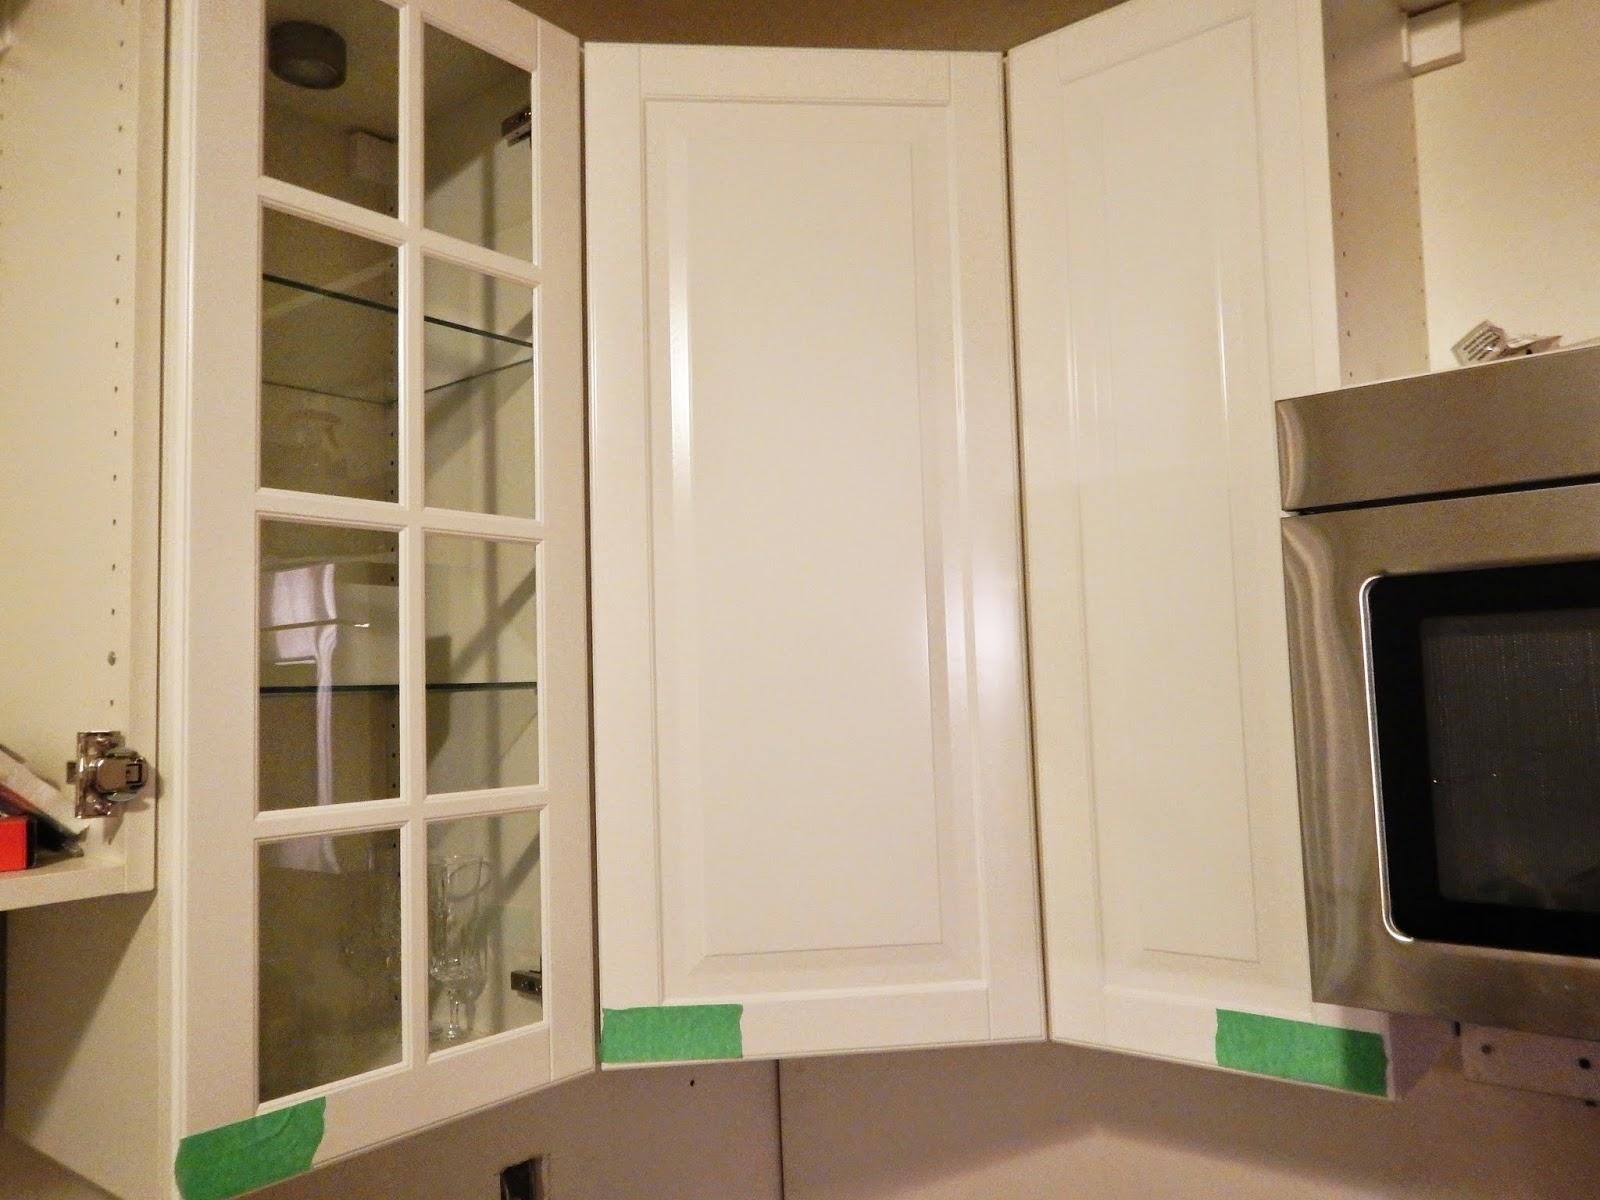 Picking A Kitchen Backsplash: Fresh Coat Of Paint: Choosing A Backsplash For The Kitchen